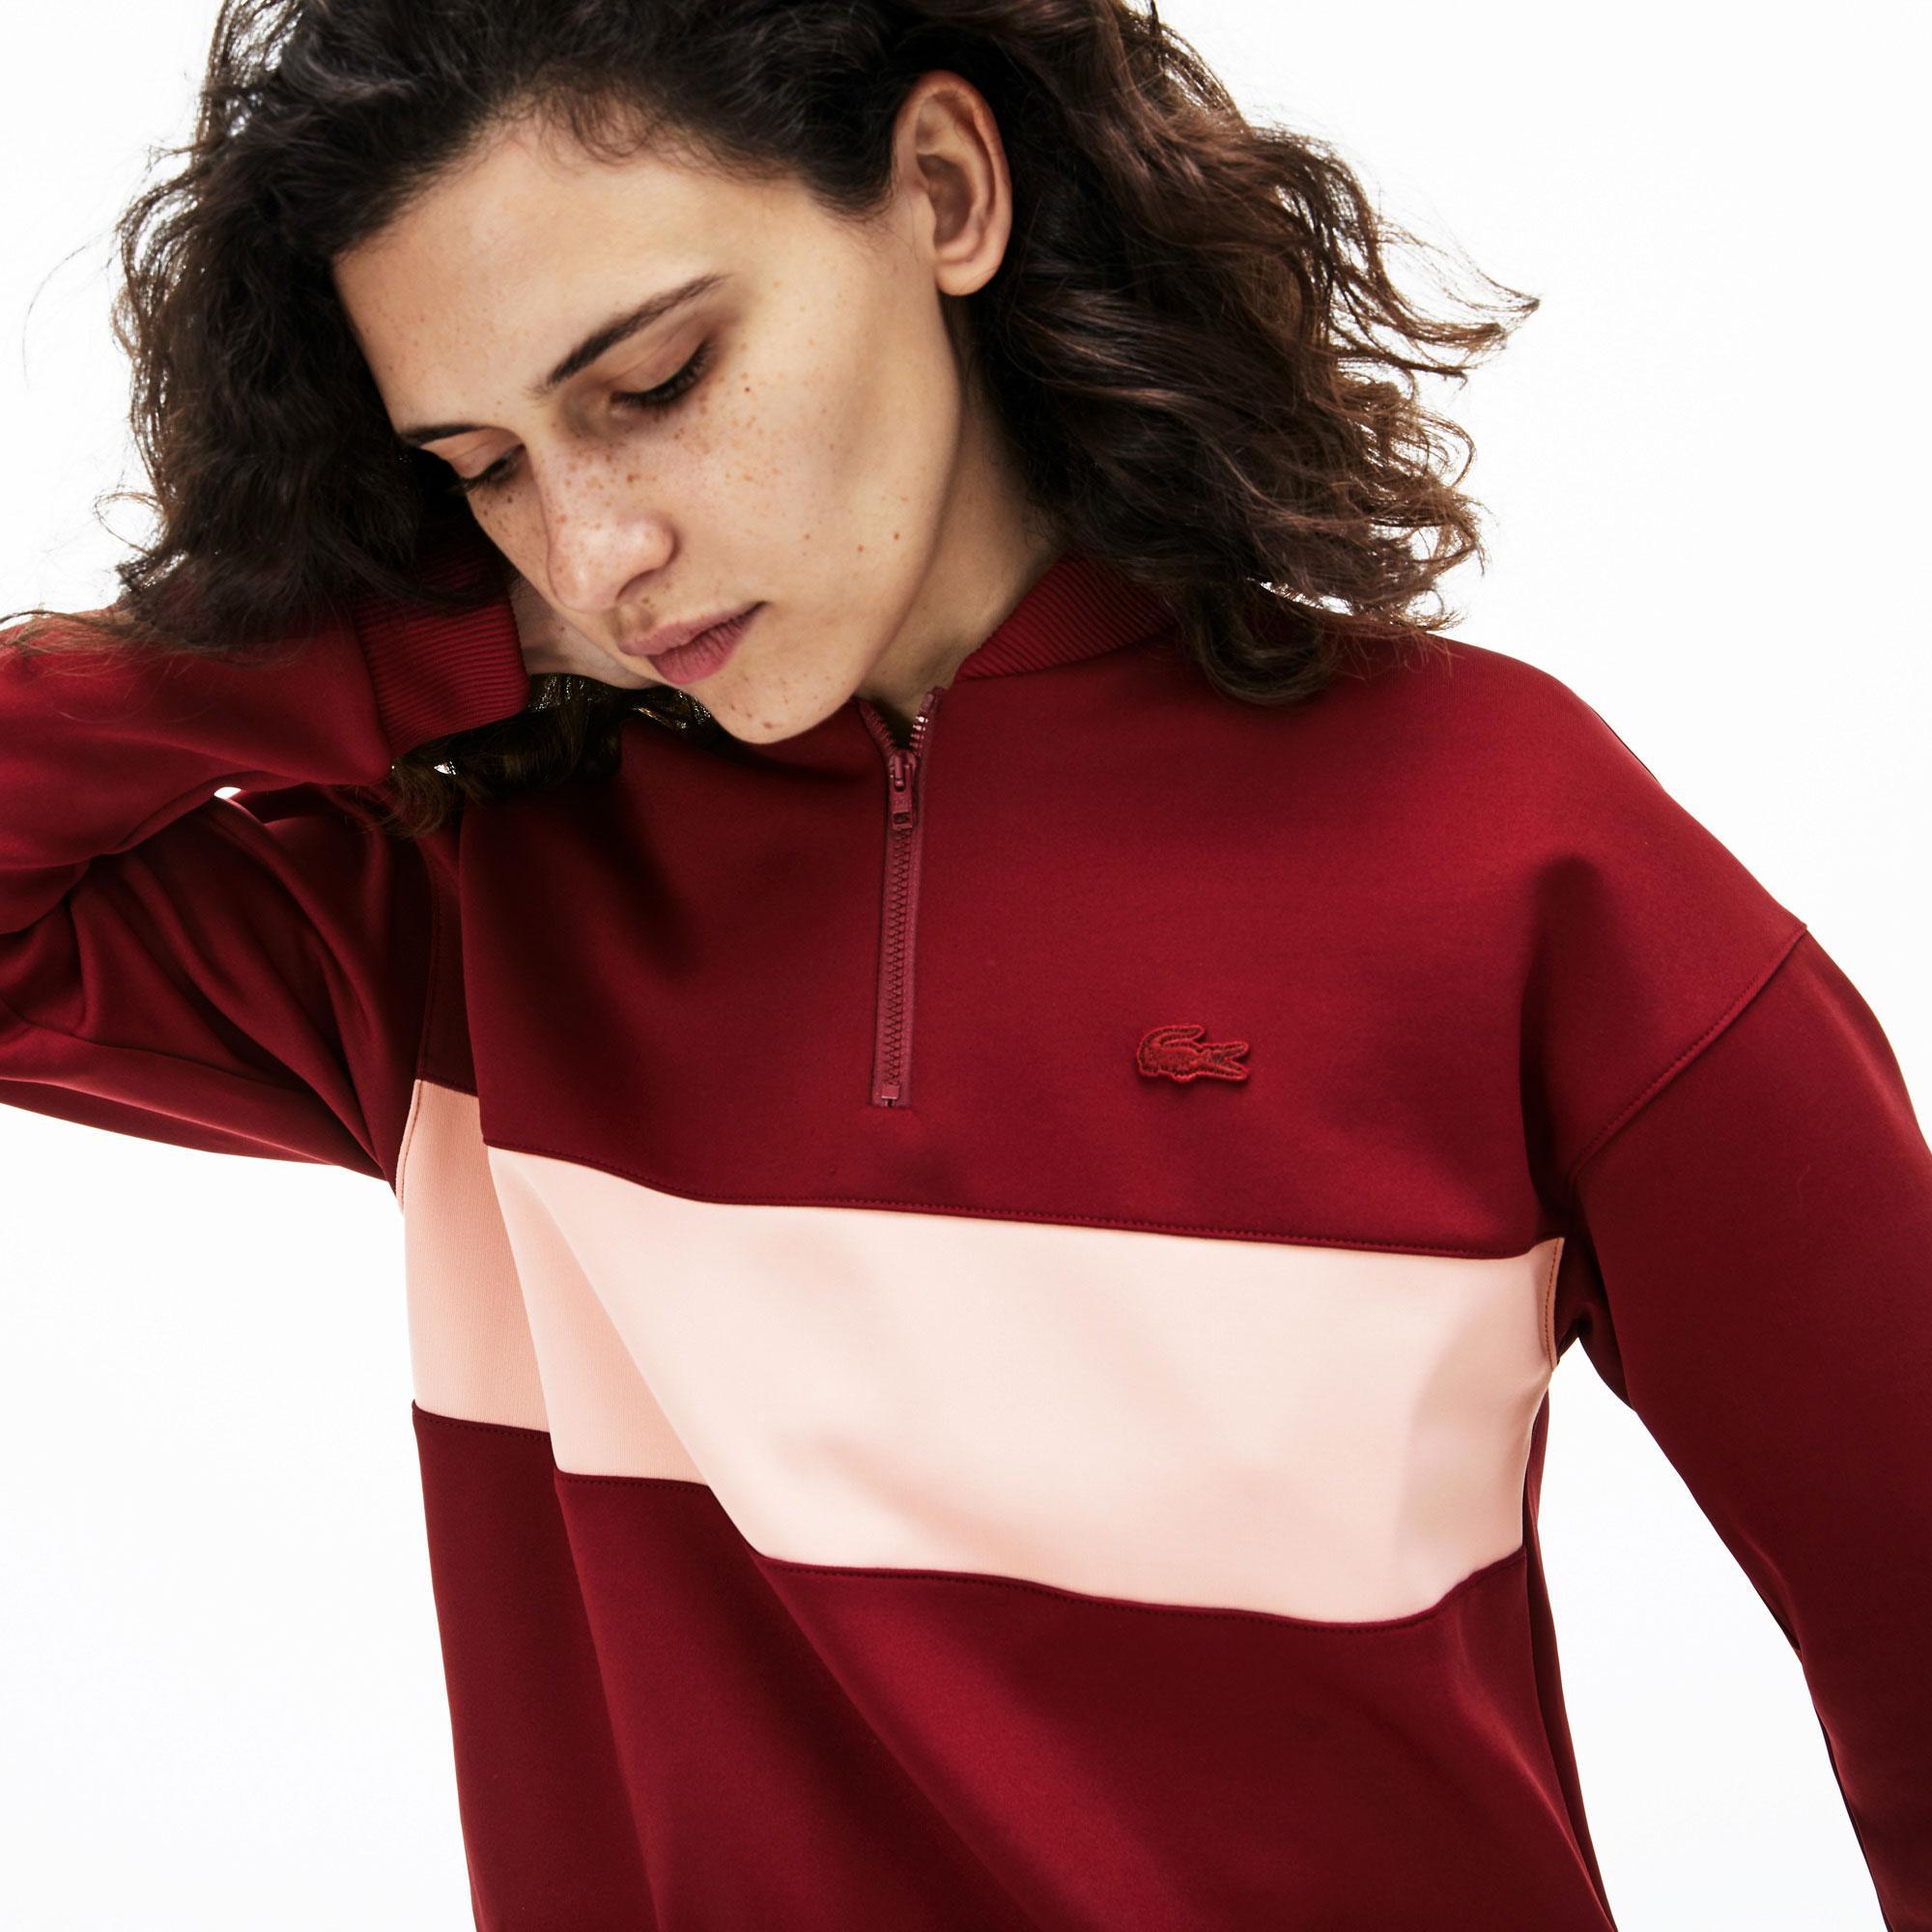 Lacoste Kadın Desenli Bordo Sweatshirt